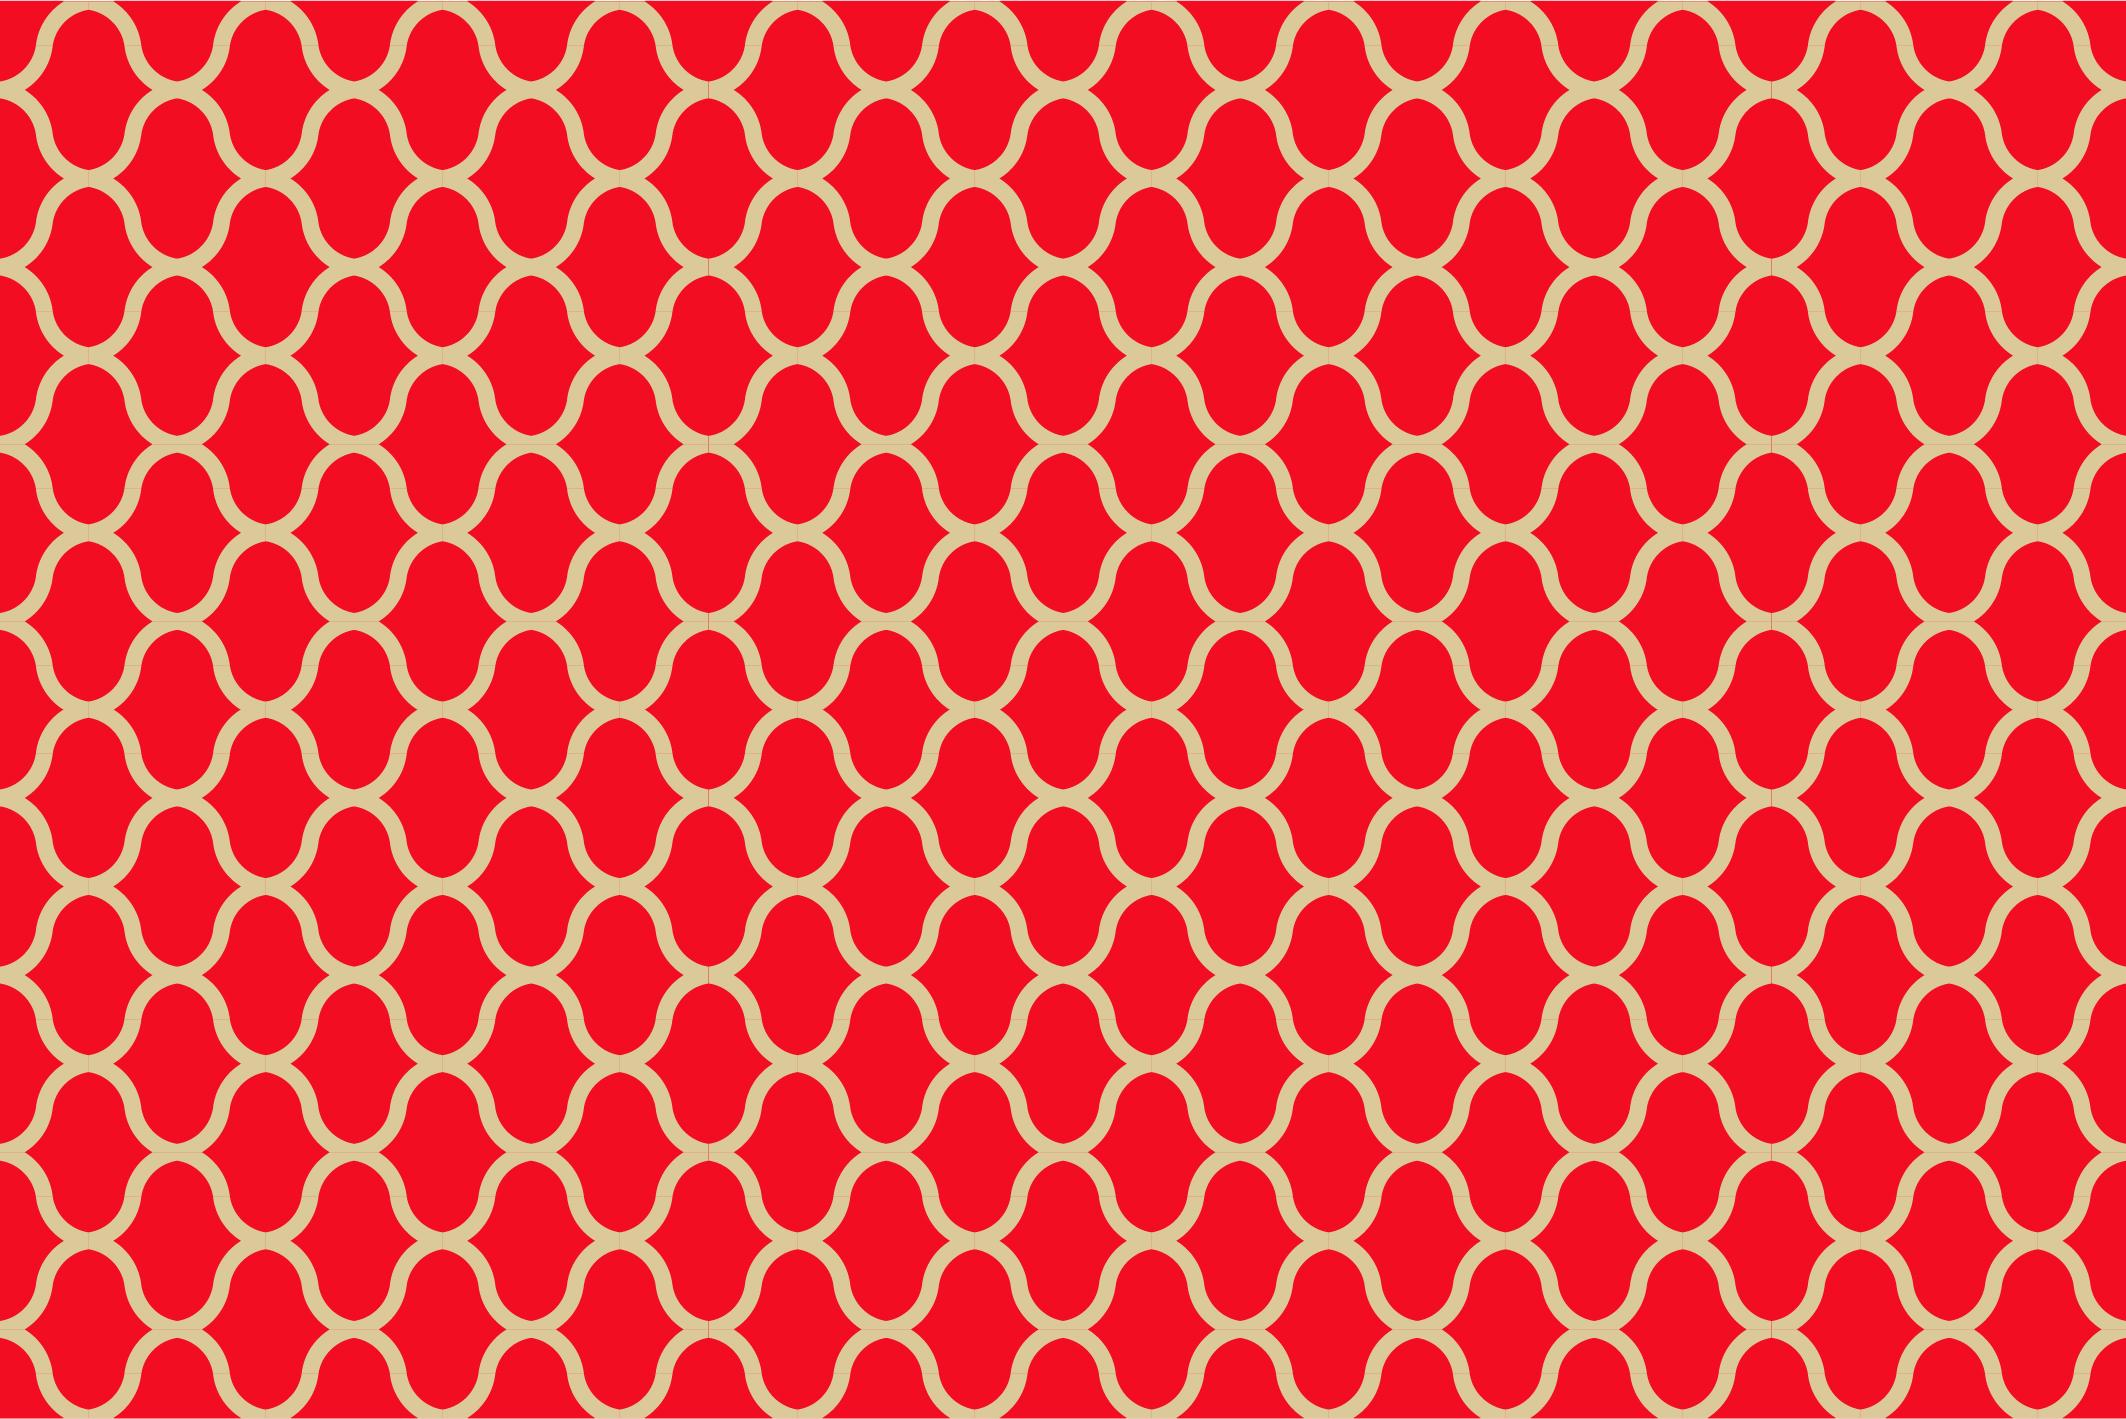 Luxury ornamental seamless patterns. example image 2